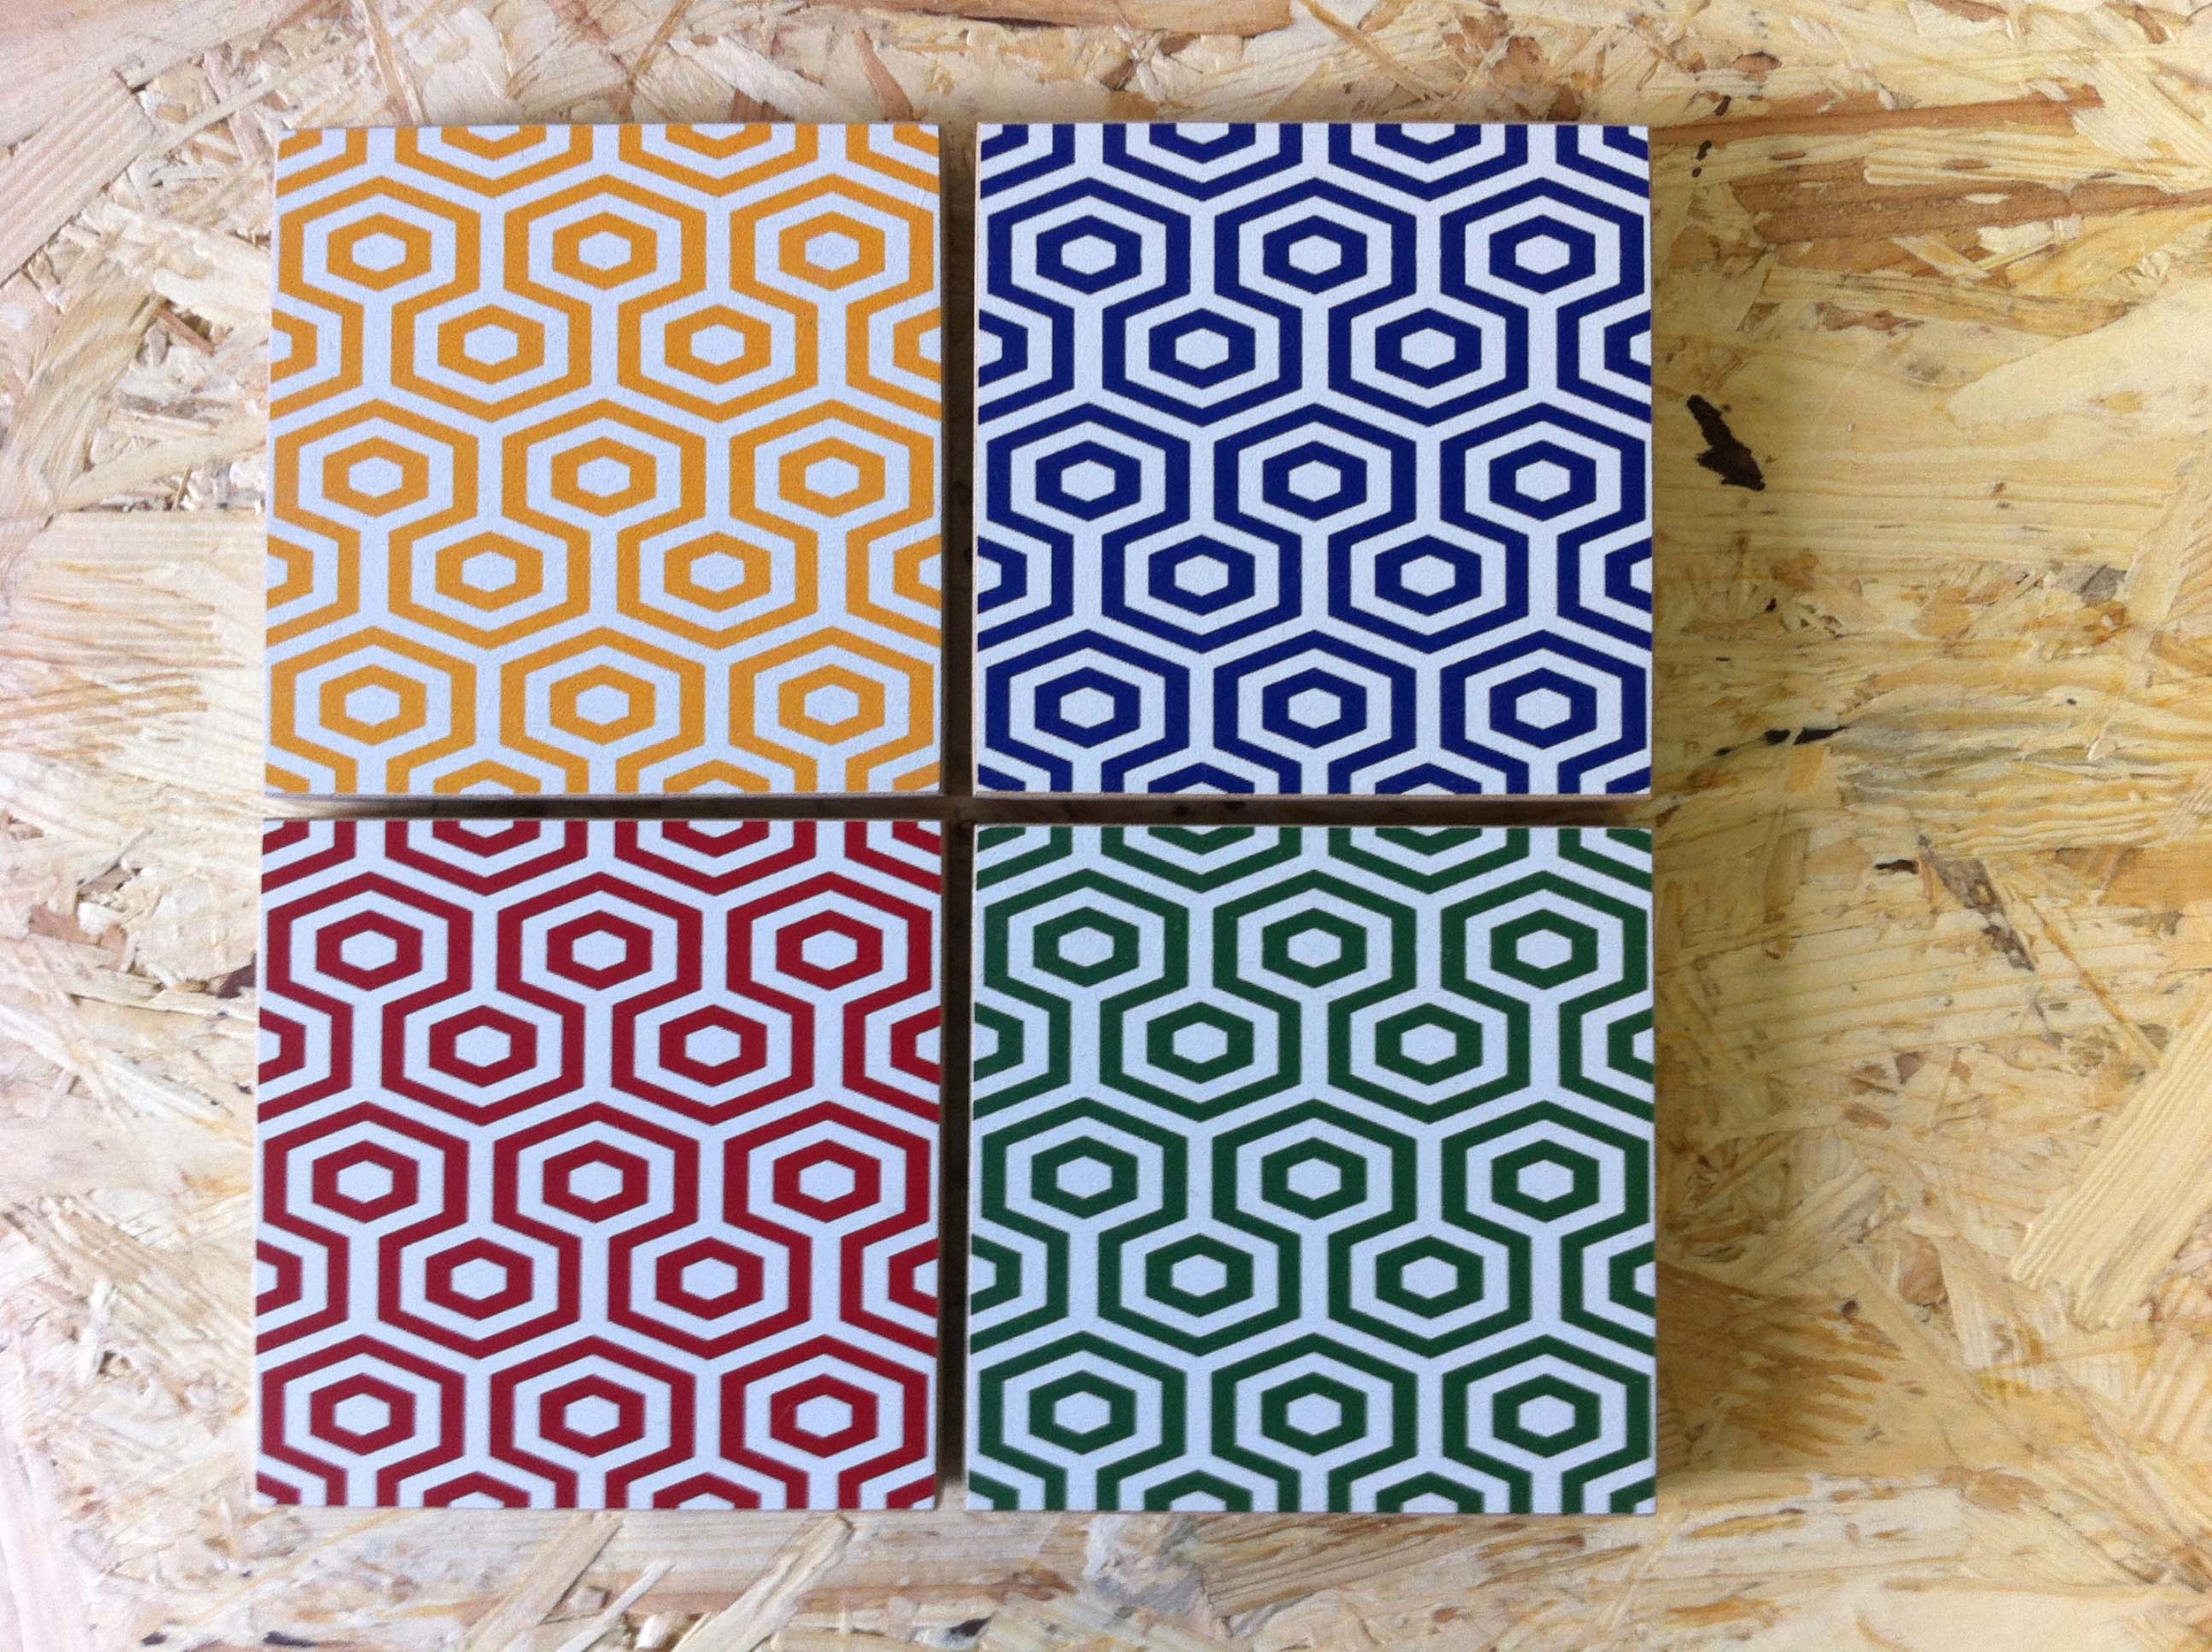 4 scnadinave patterns color ànouveau upcycling écodesign.JPG